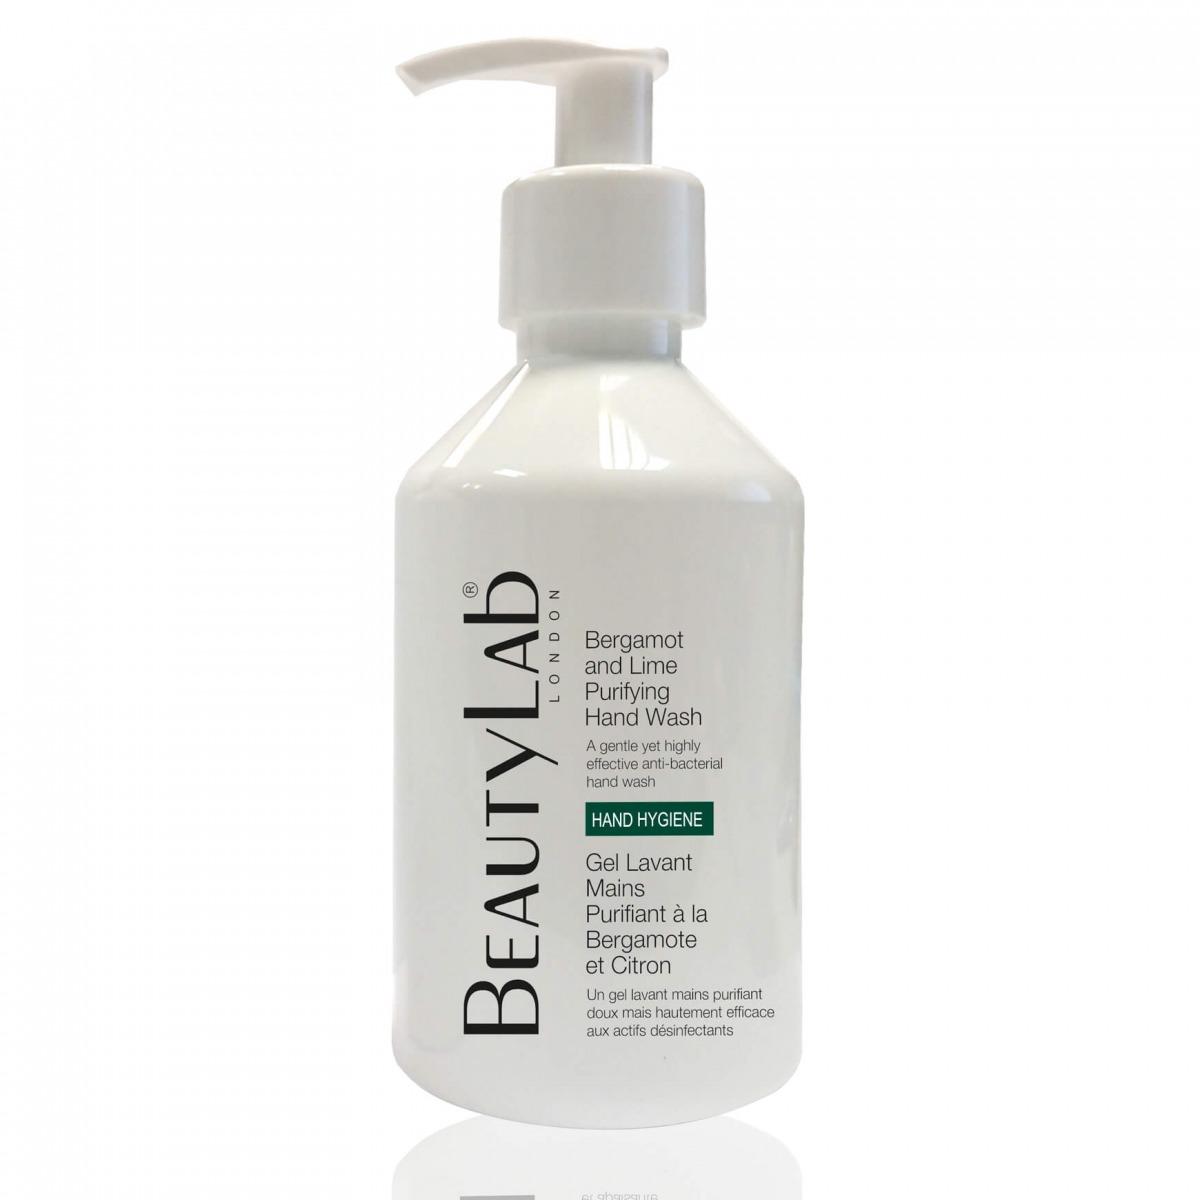 Bergamot and lime Purifying Hand Wash